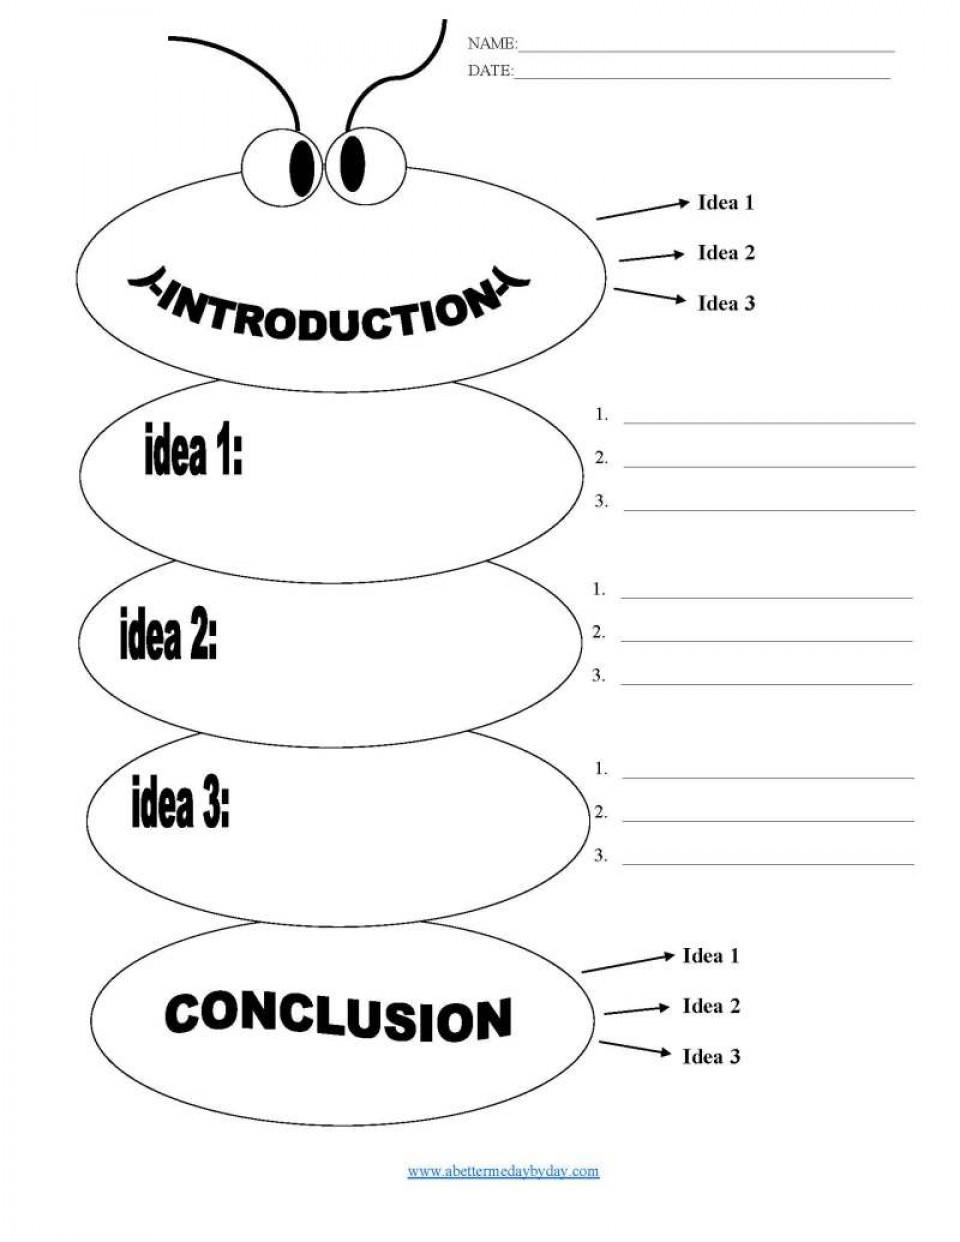 006 Letter Outline Generator Inspirationa Hook Maker For